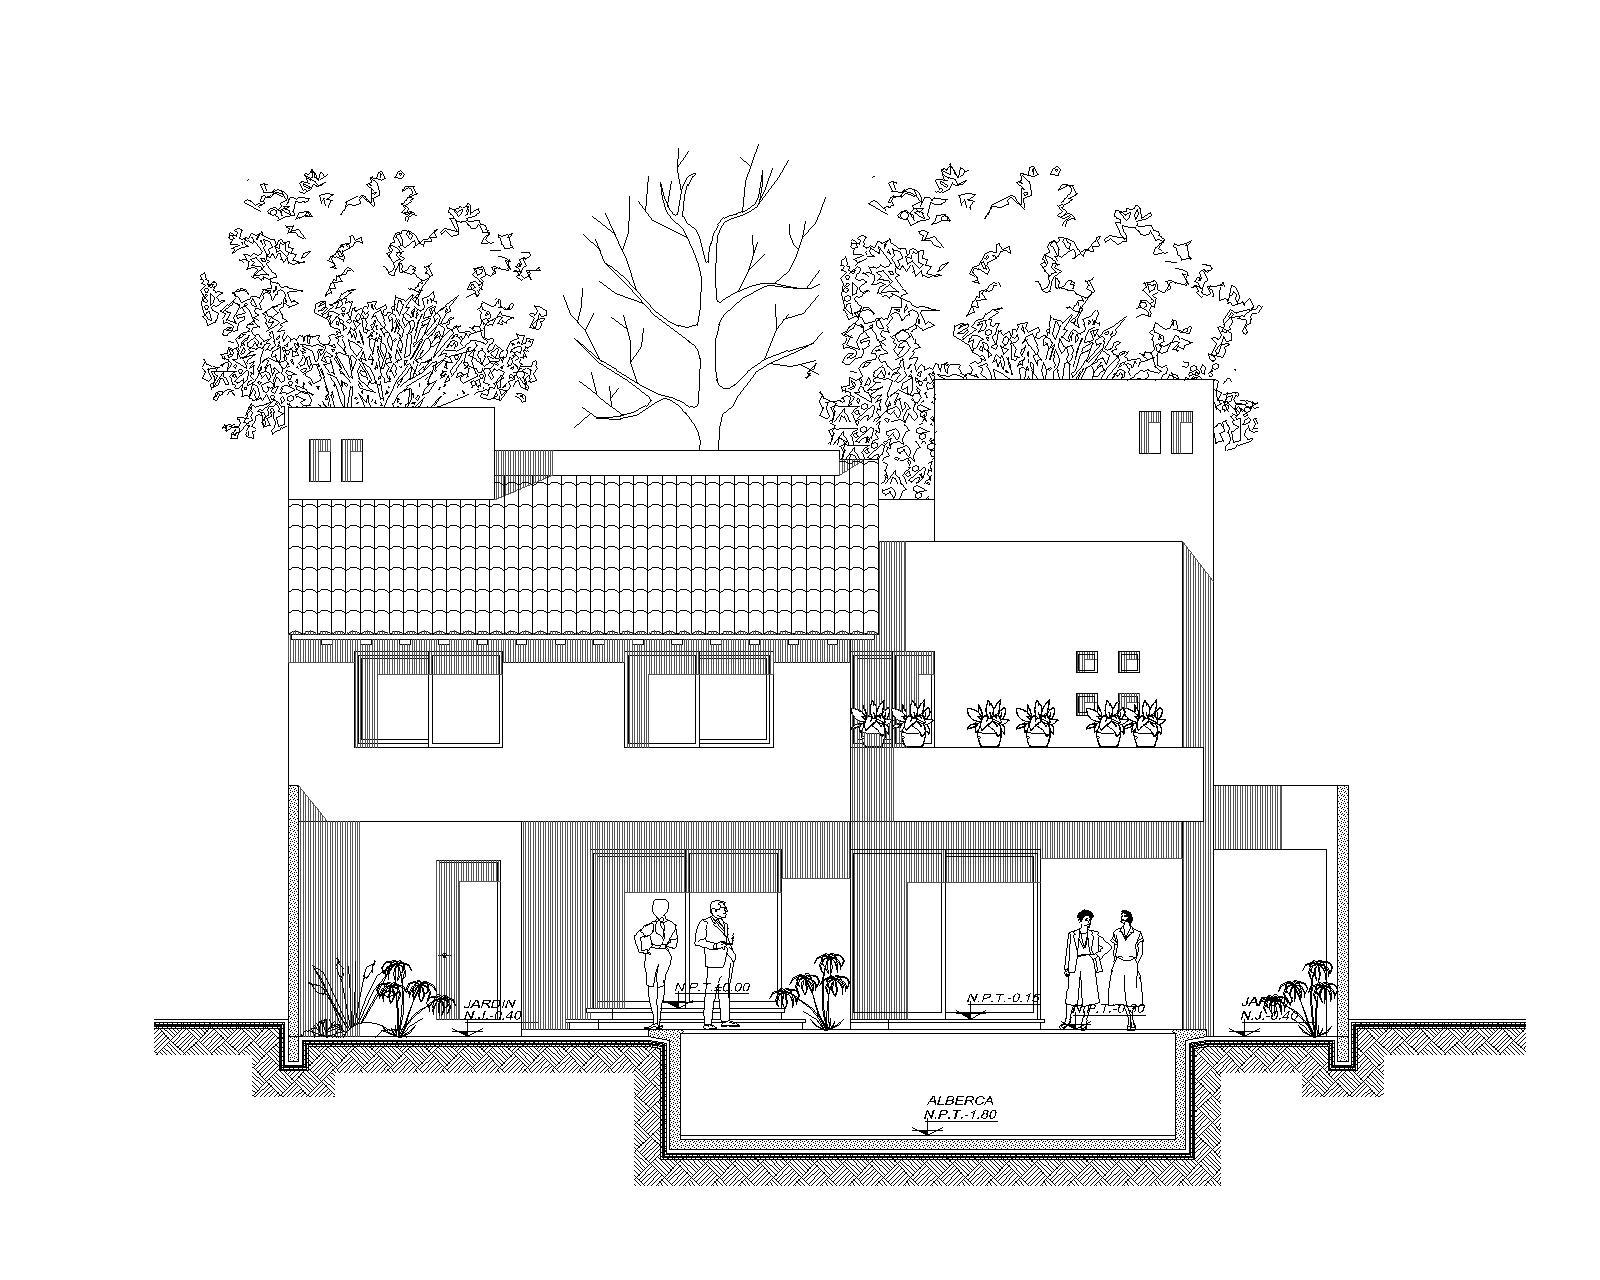 Residencial bonanza grupo mobilart for Proyecto casa habitacion minimalista